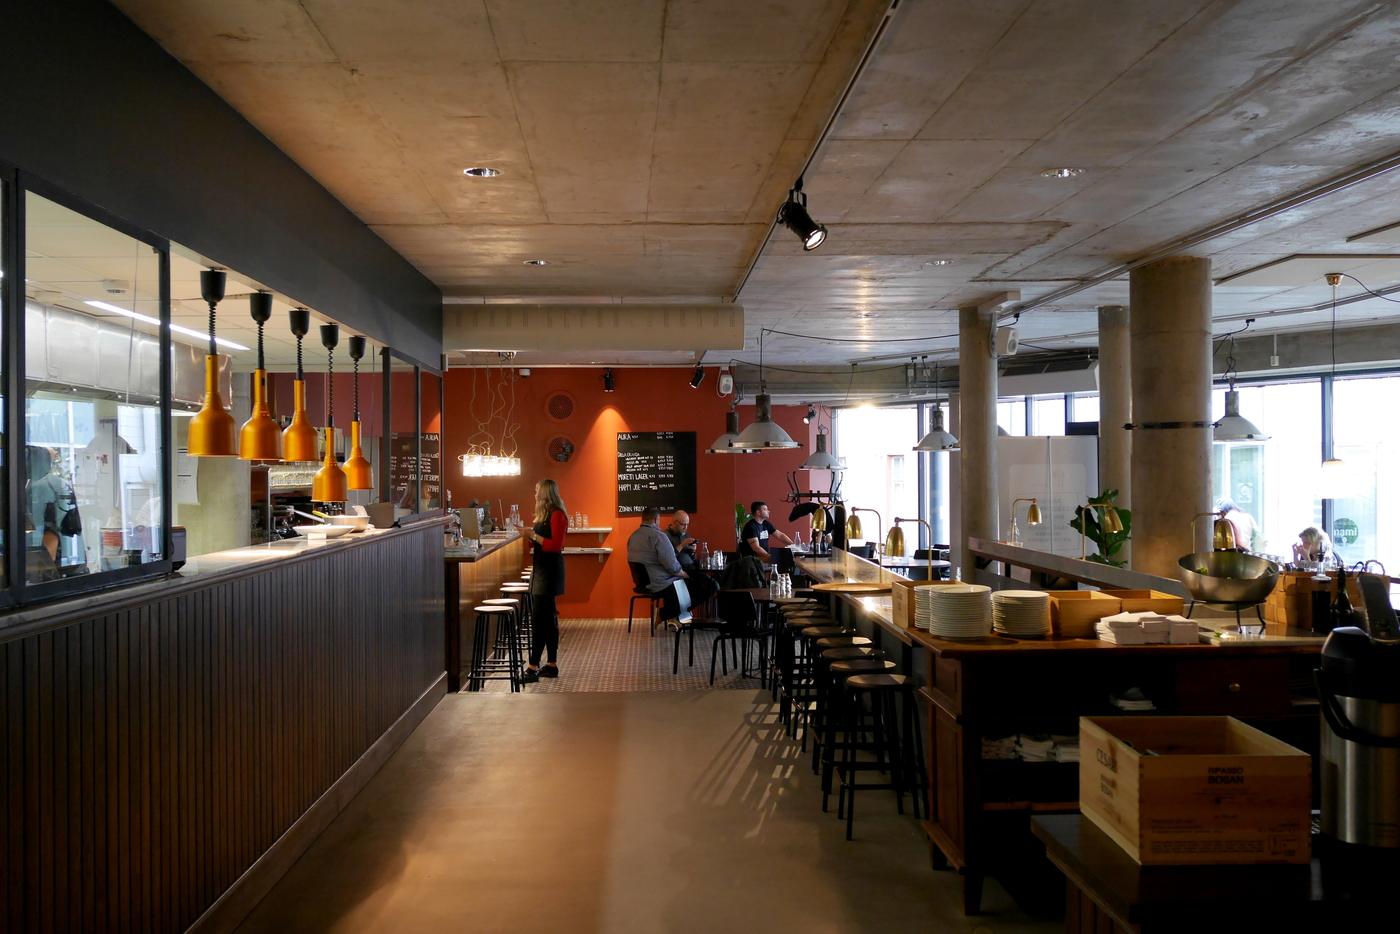 Ravintola Paninin lounas, Turku